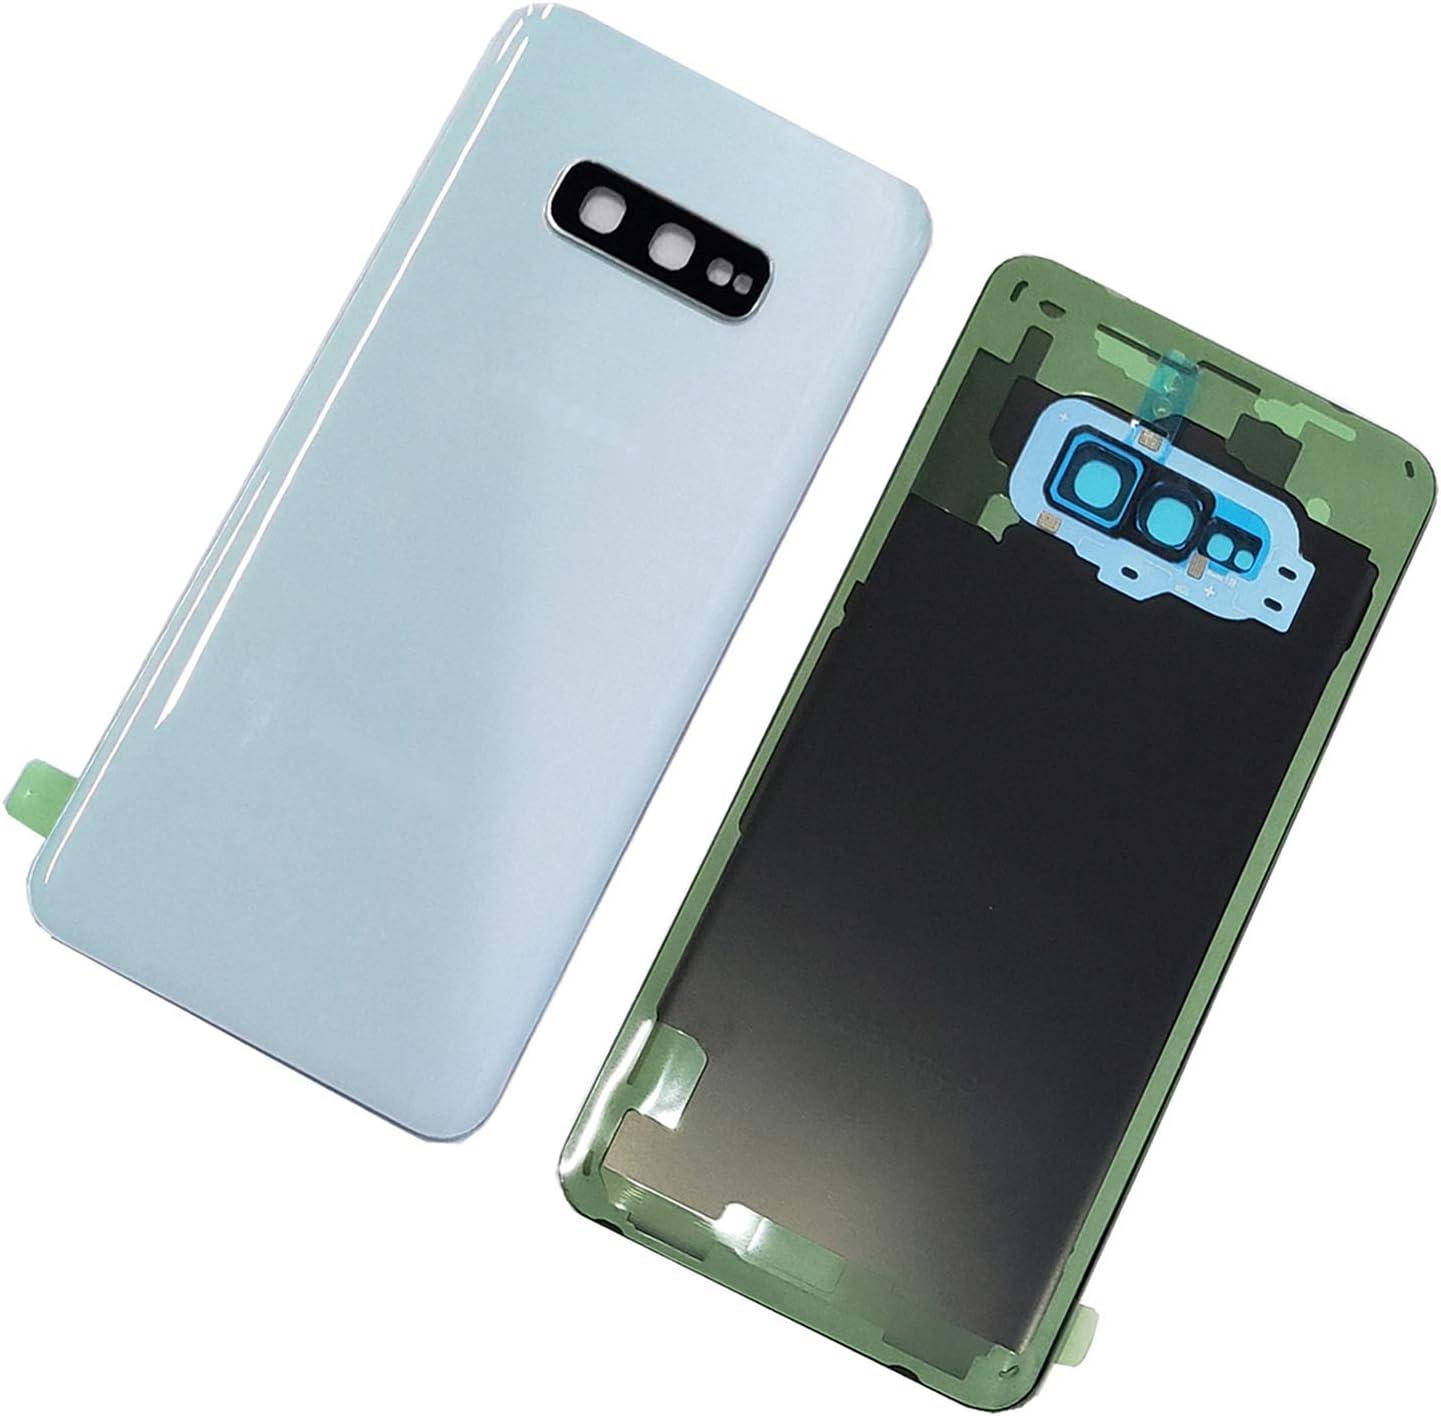 Vidrio Trasero Para Samsung Galaxy S10e G970u G970w G970f